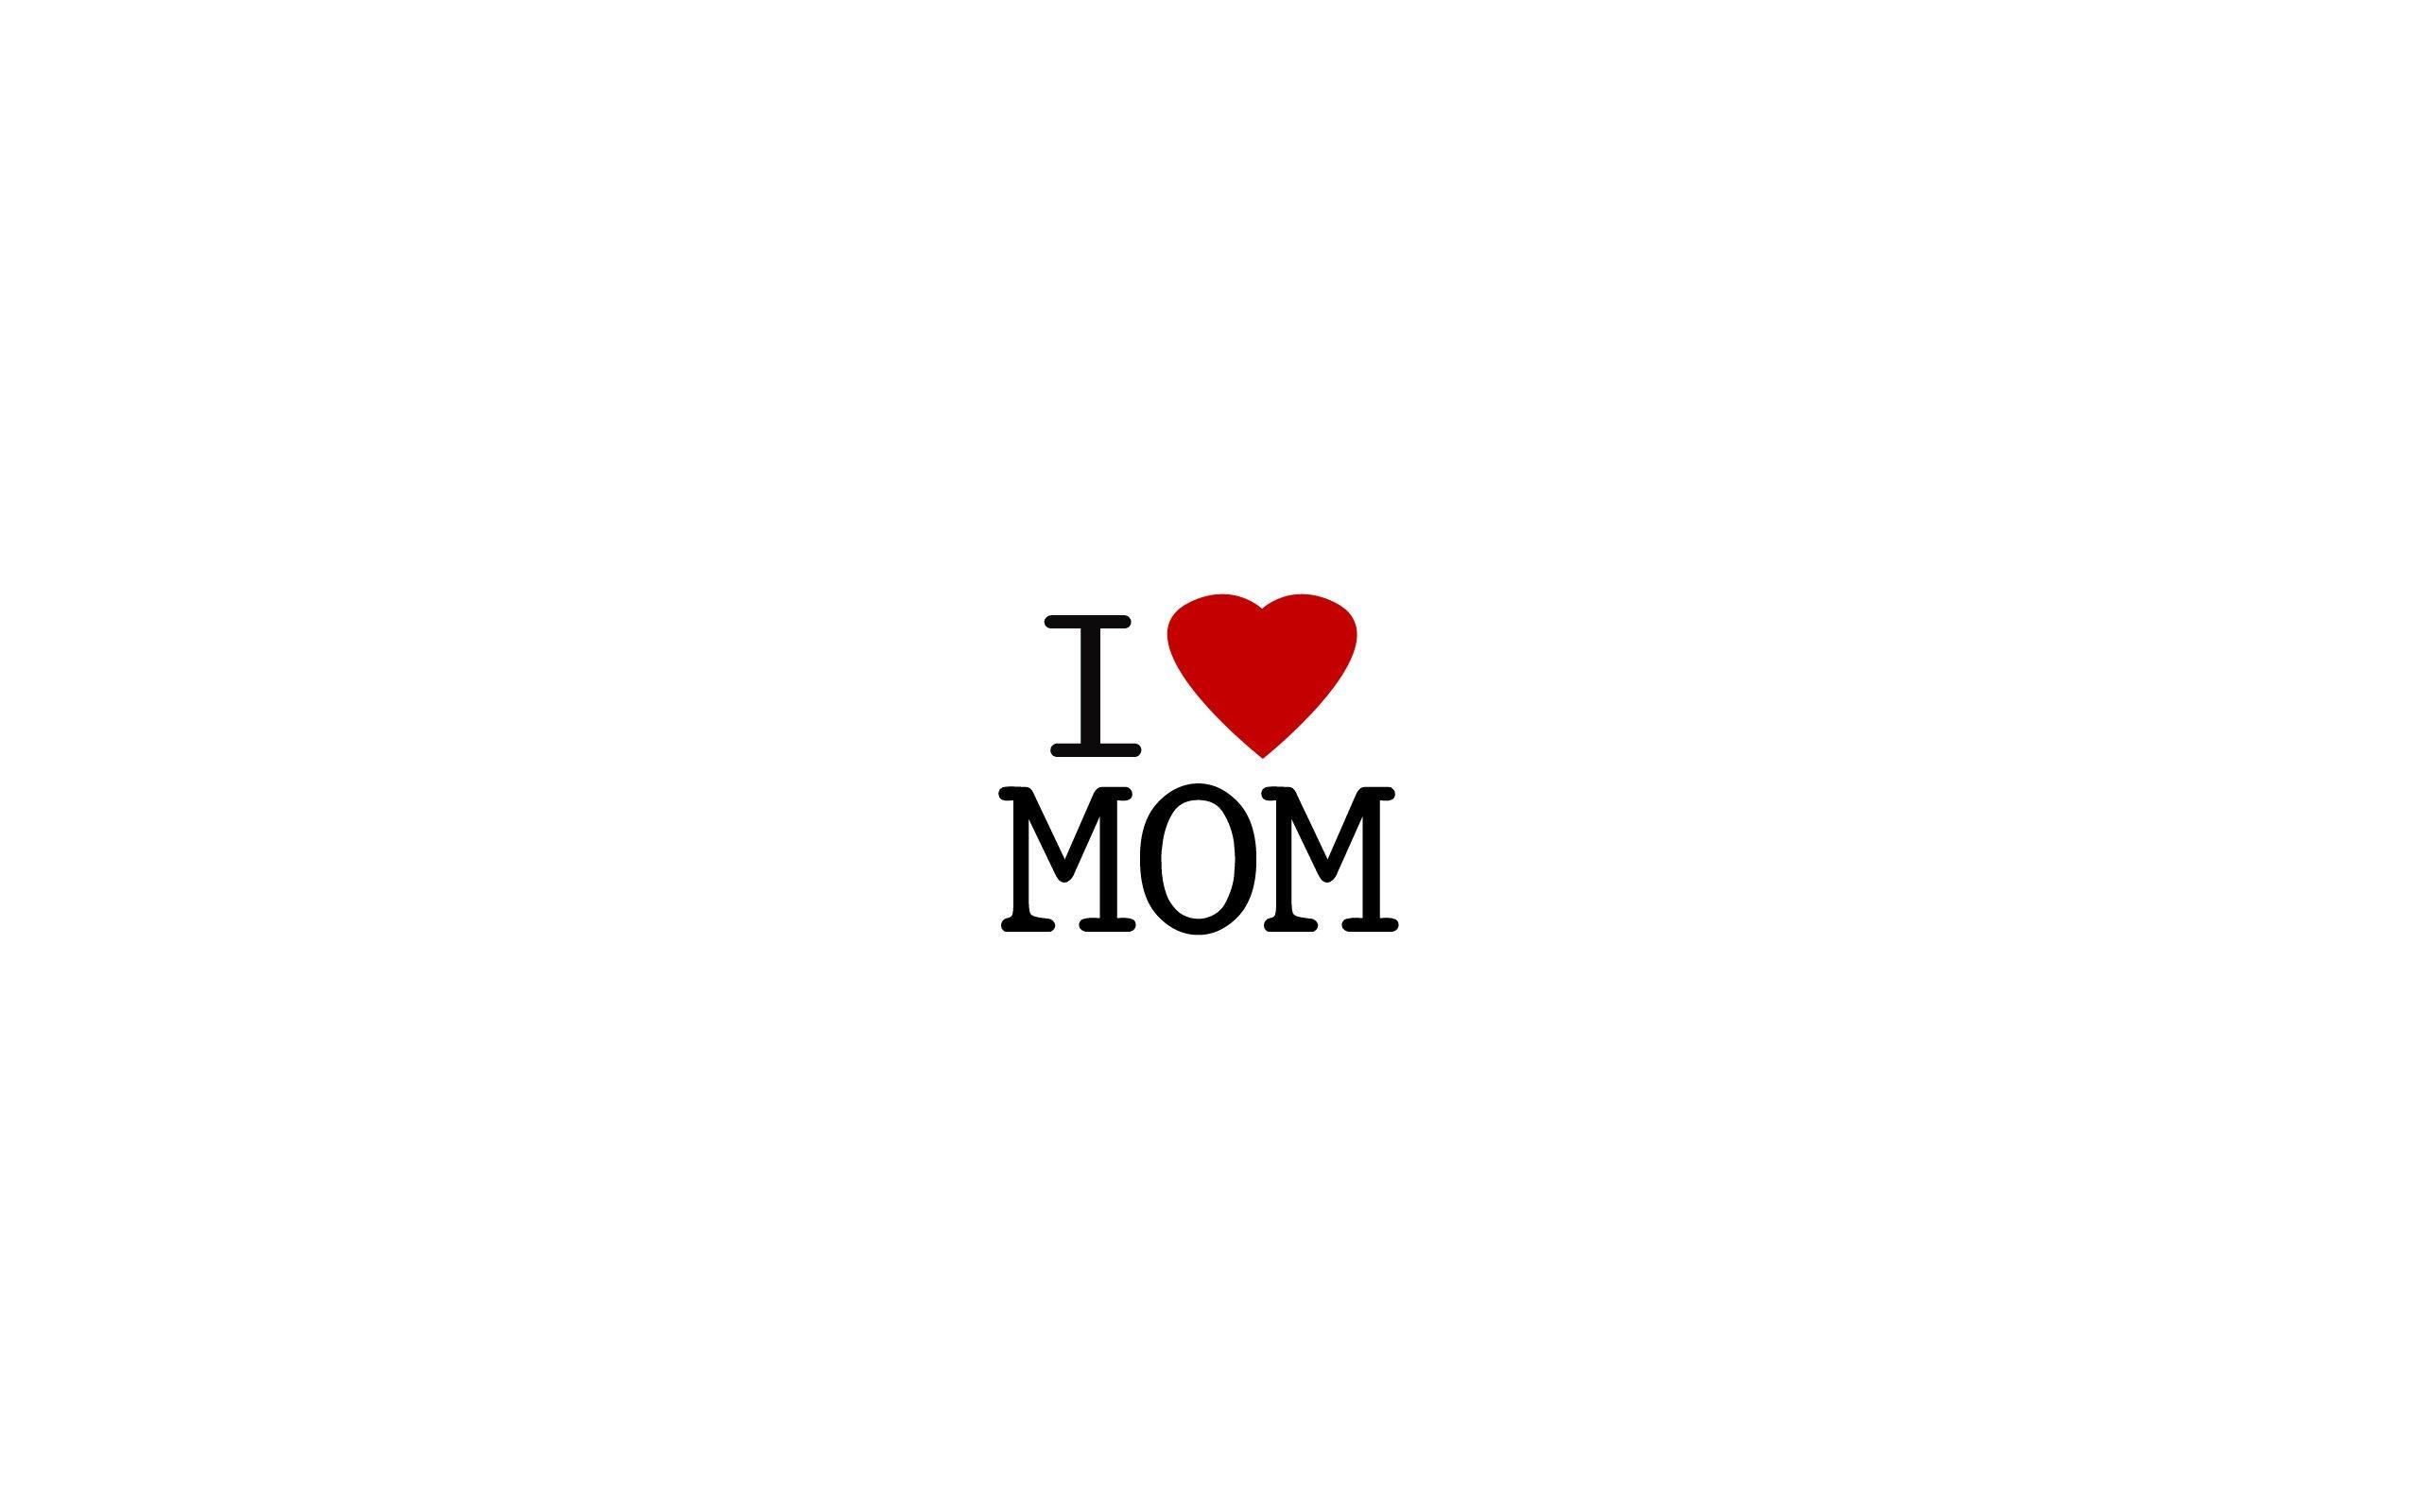 I Love You Mom Images for Facebook